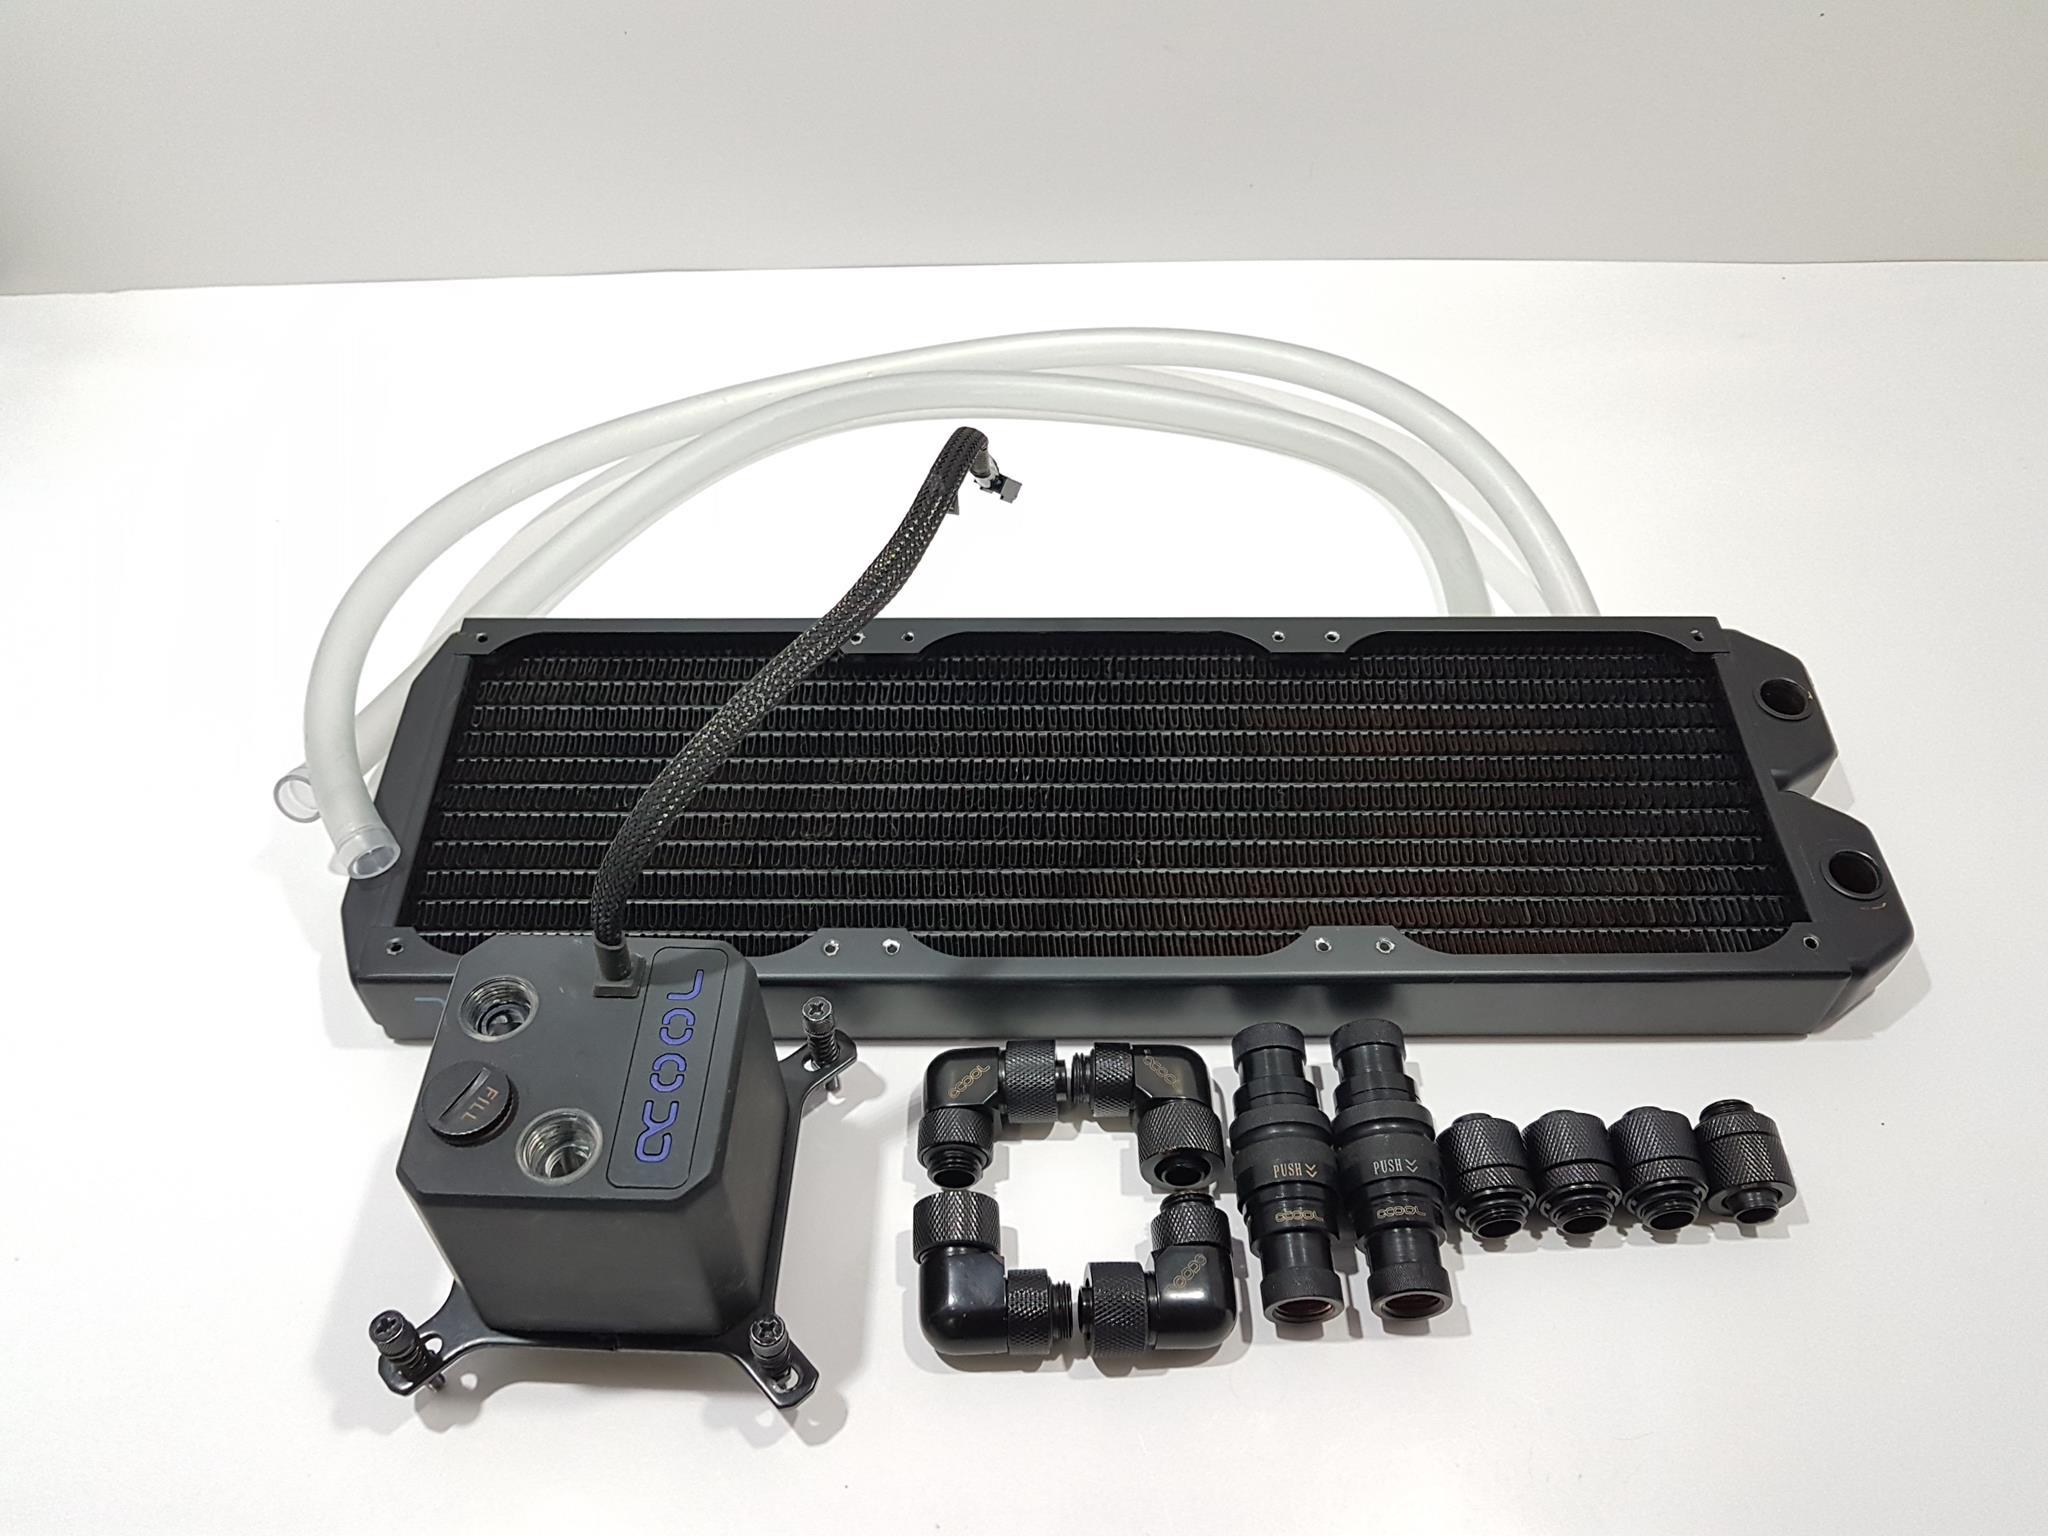 Full Copper G1//4 360mm 13 Tubes Computer Water Cooling Radiator CPU GPU Heatsink